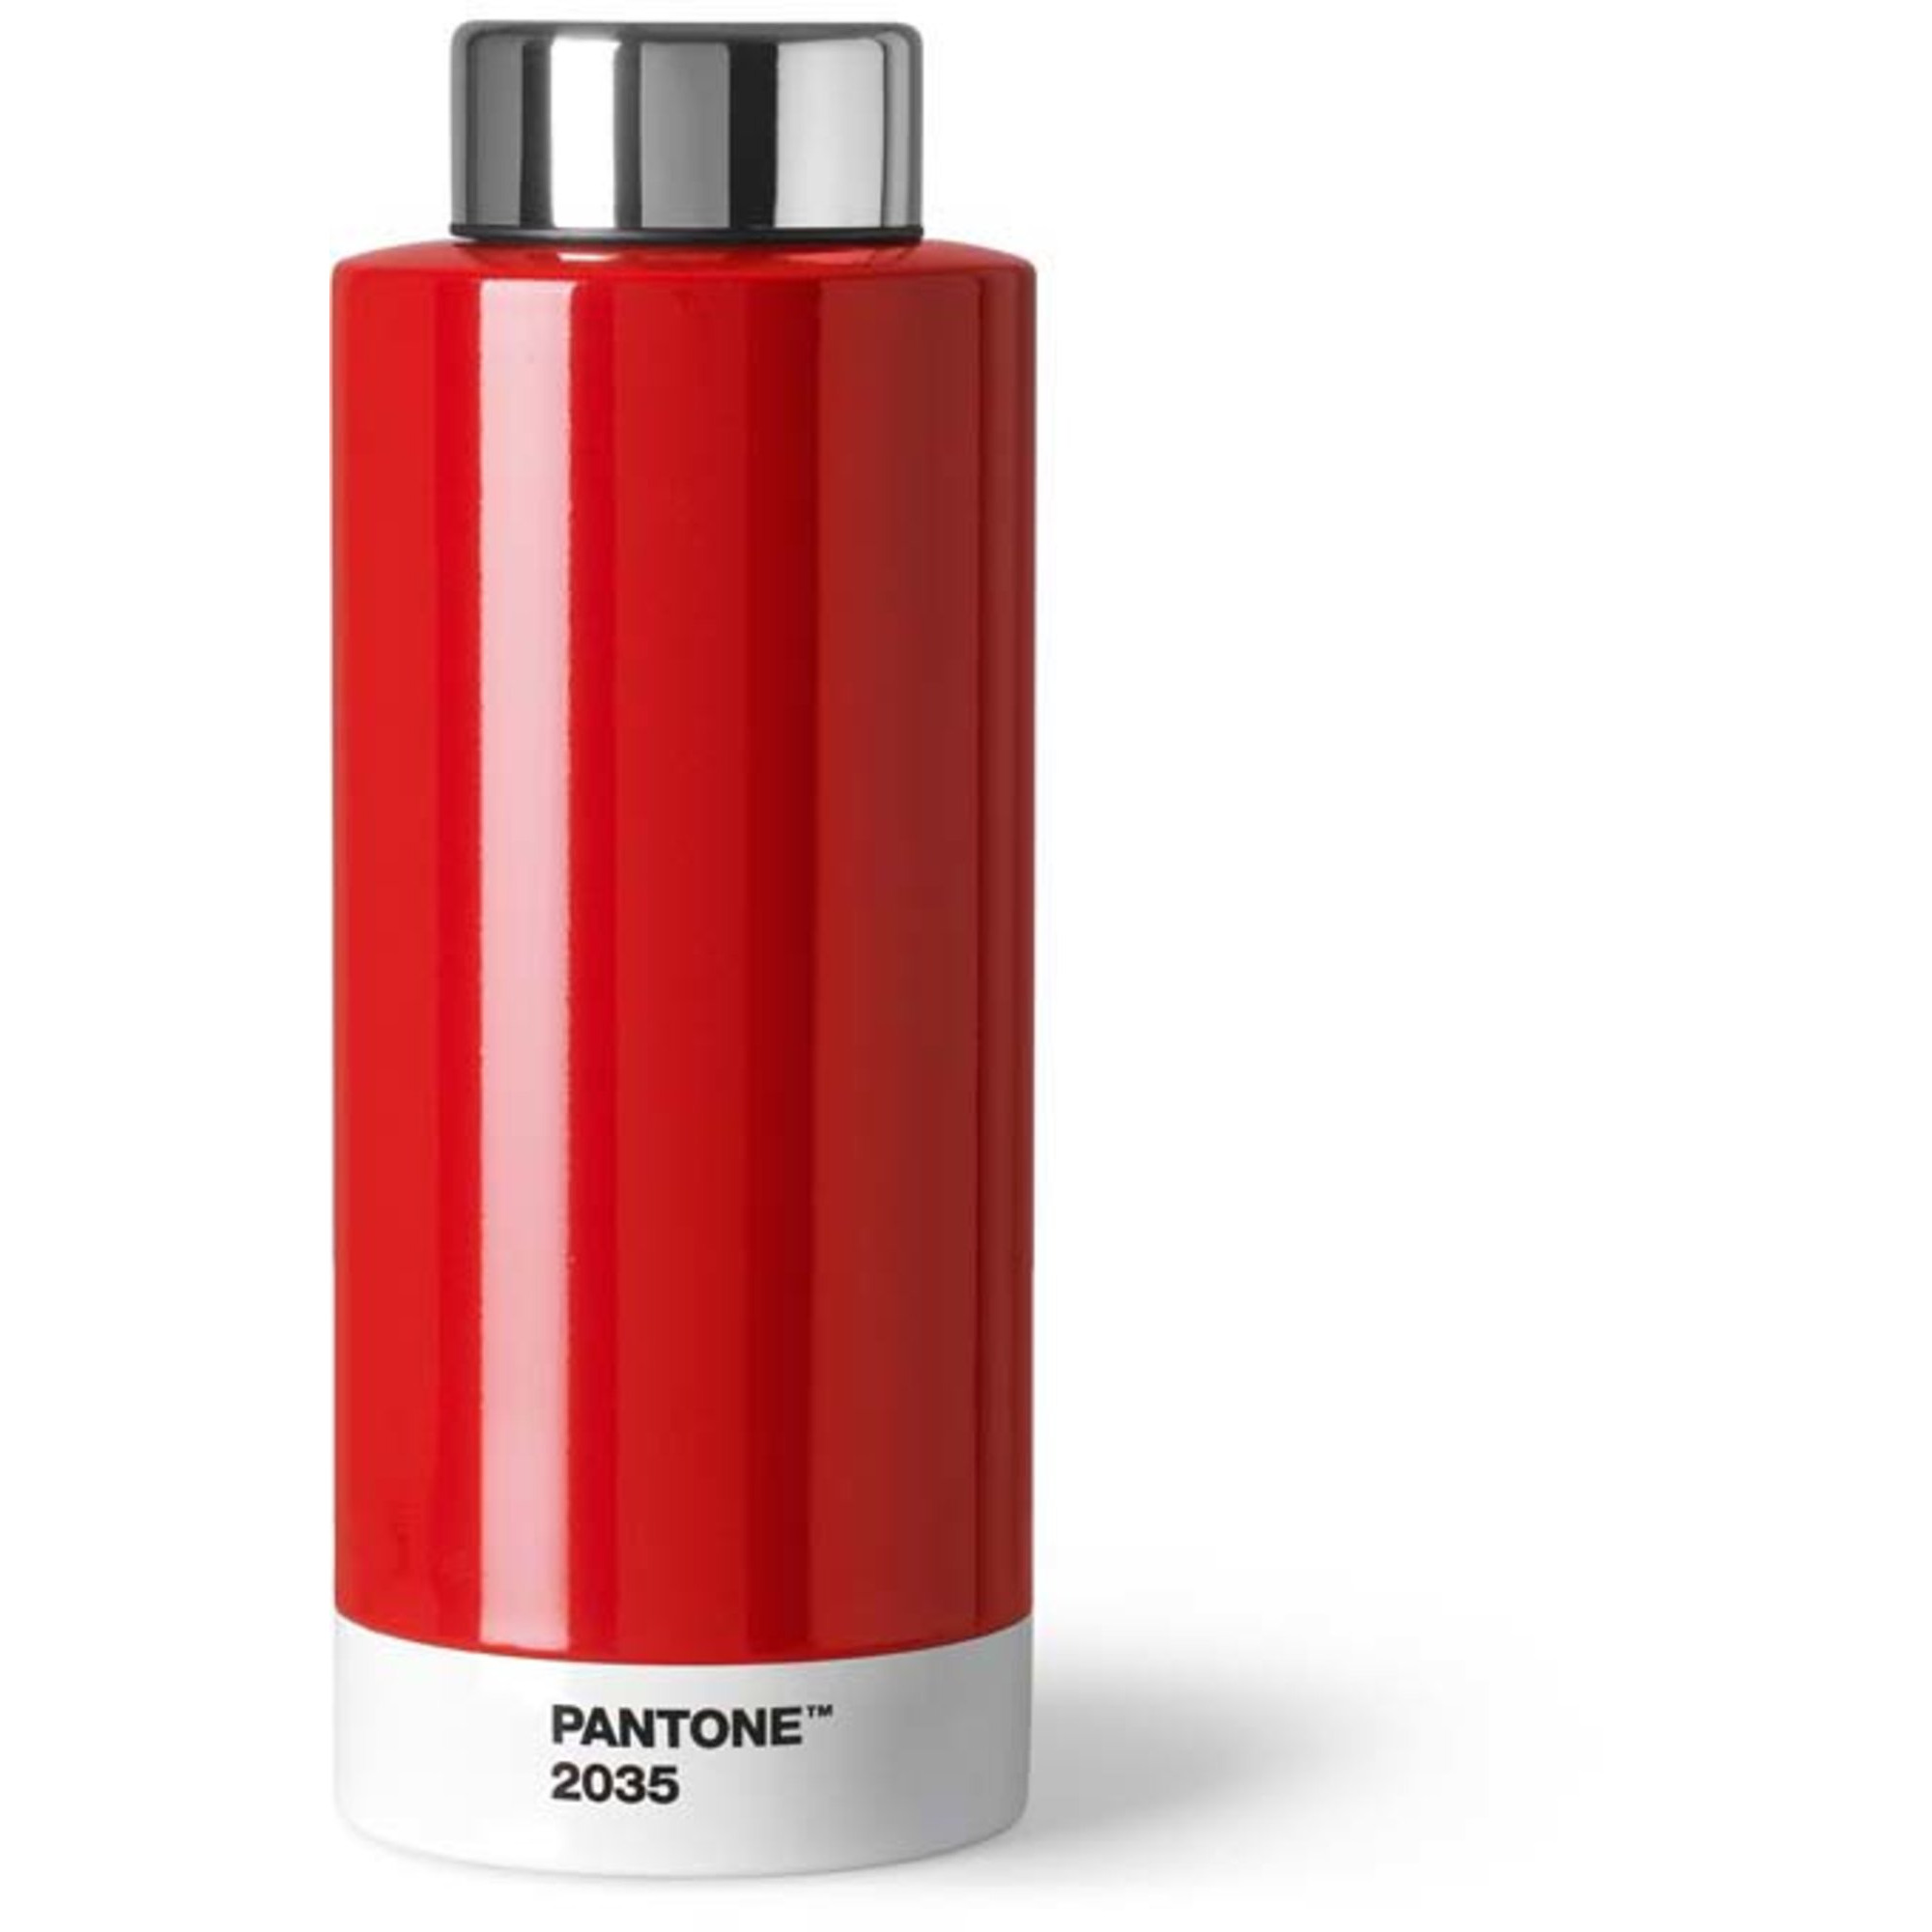 Pantone Living Vattenflaska 63 cl Röd